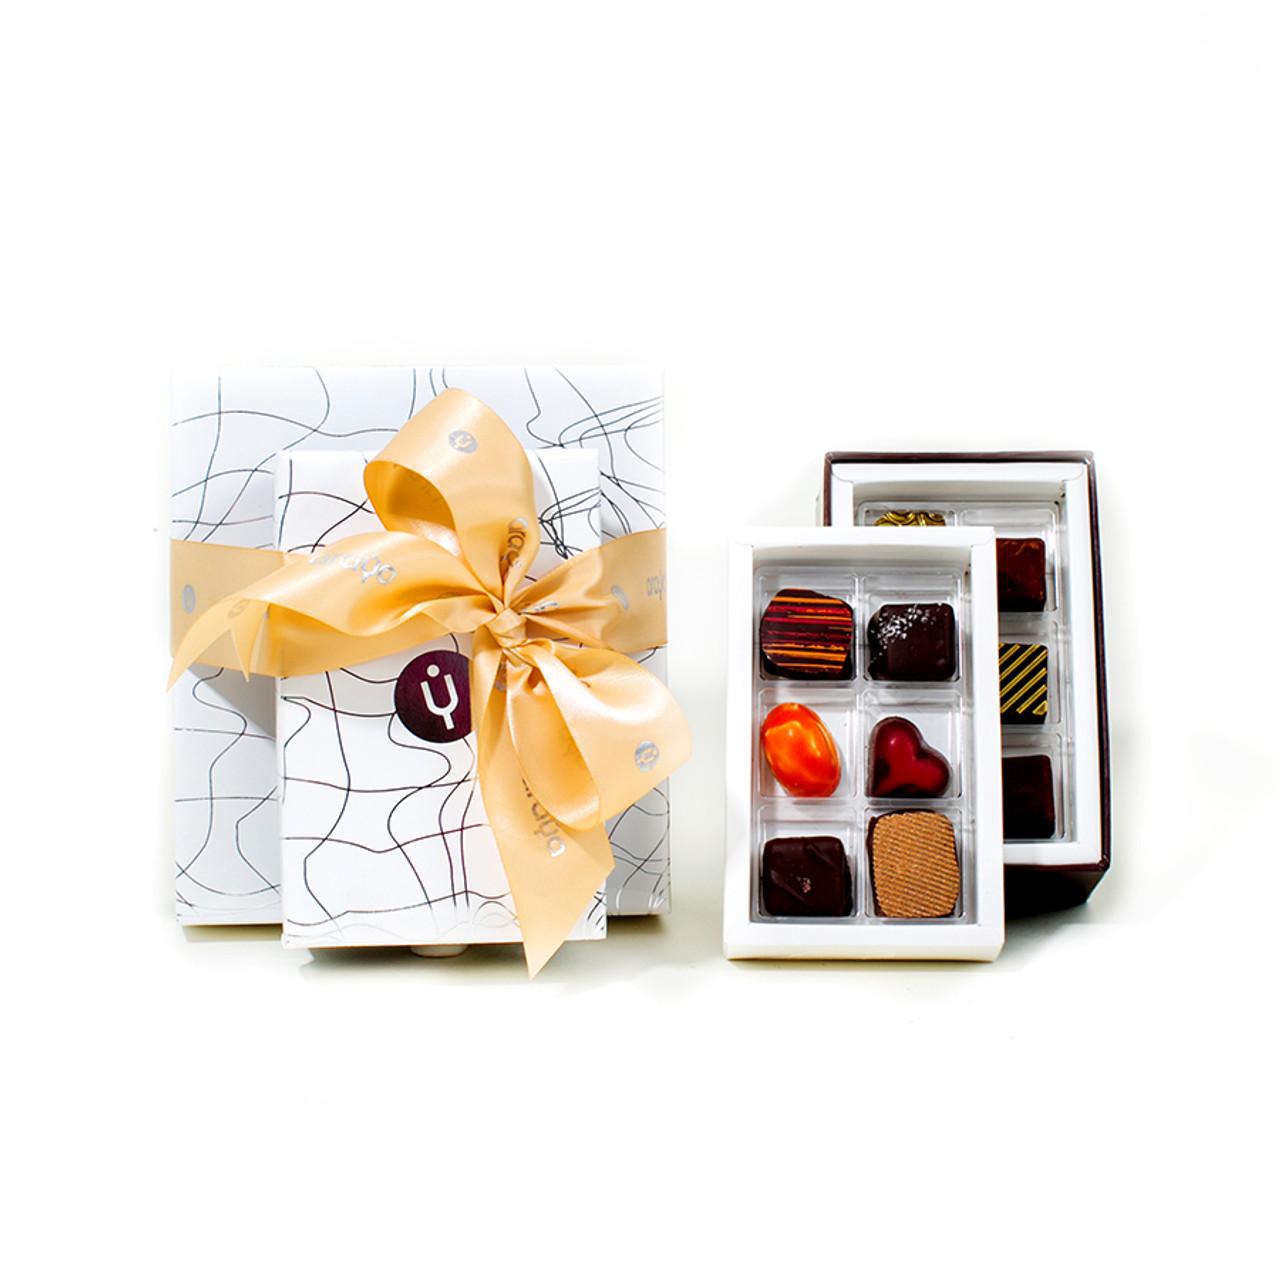 12 Chocolate Gift Box (Two layers)